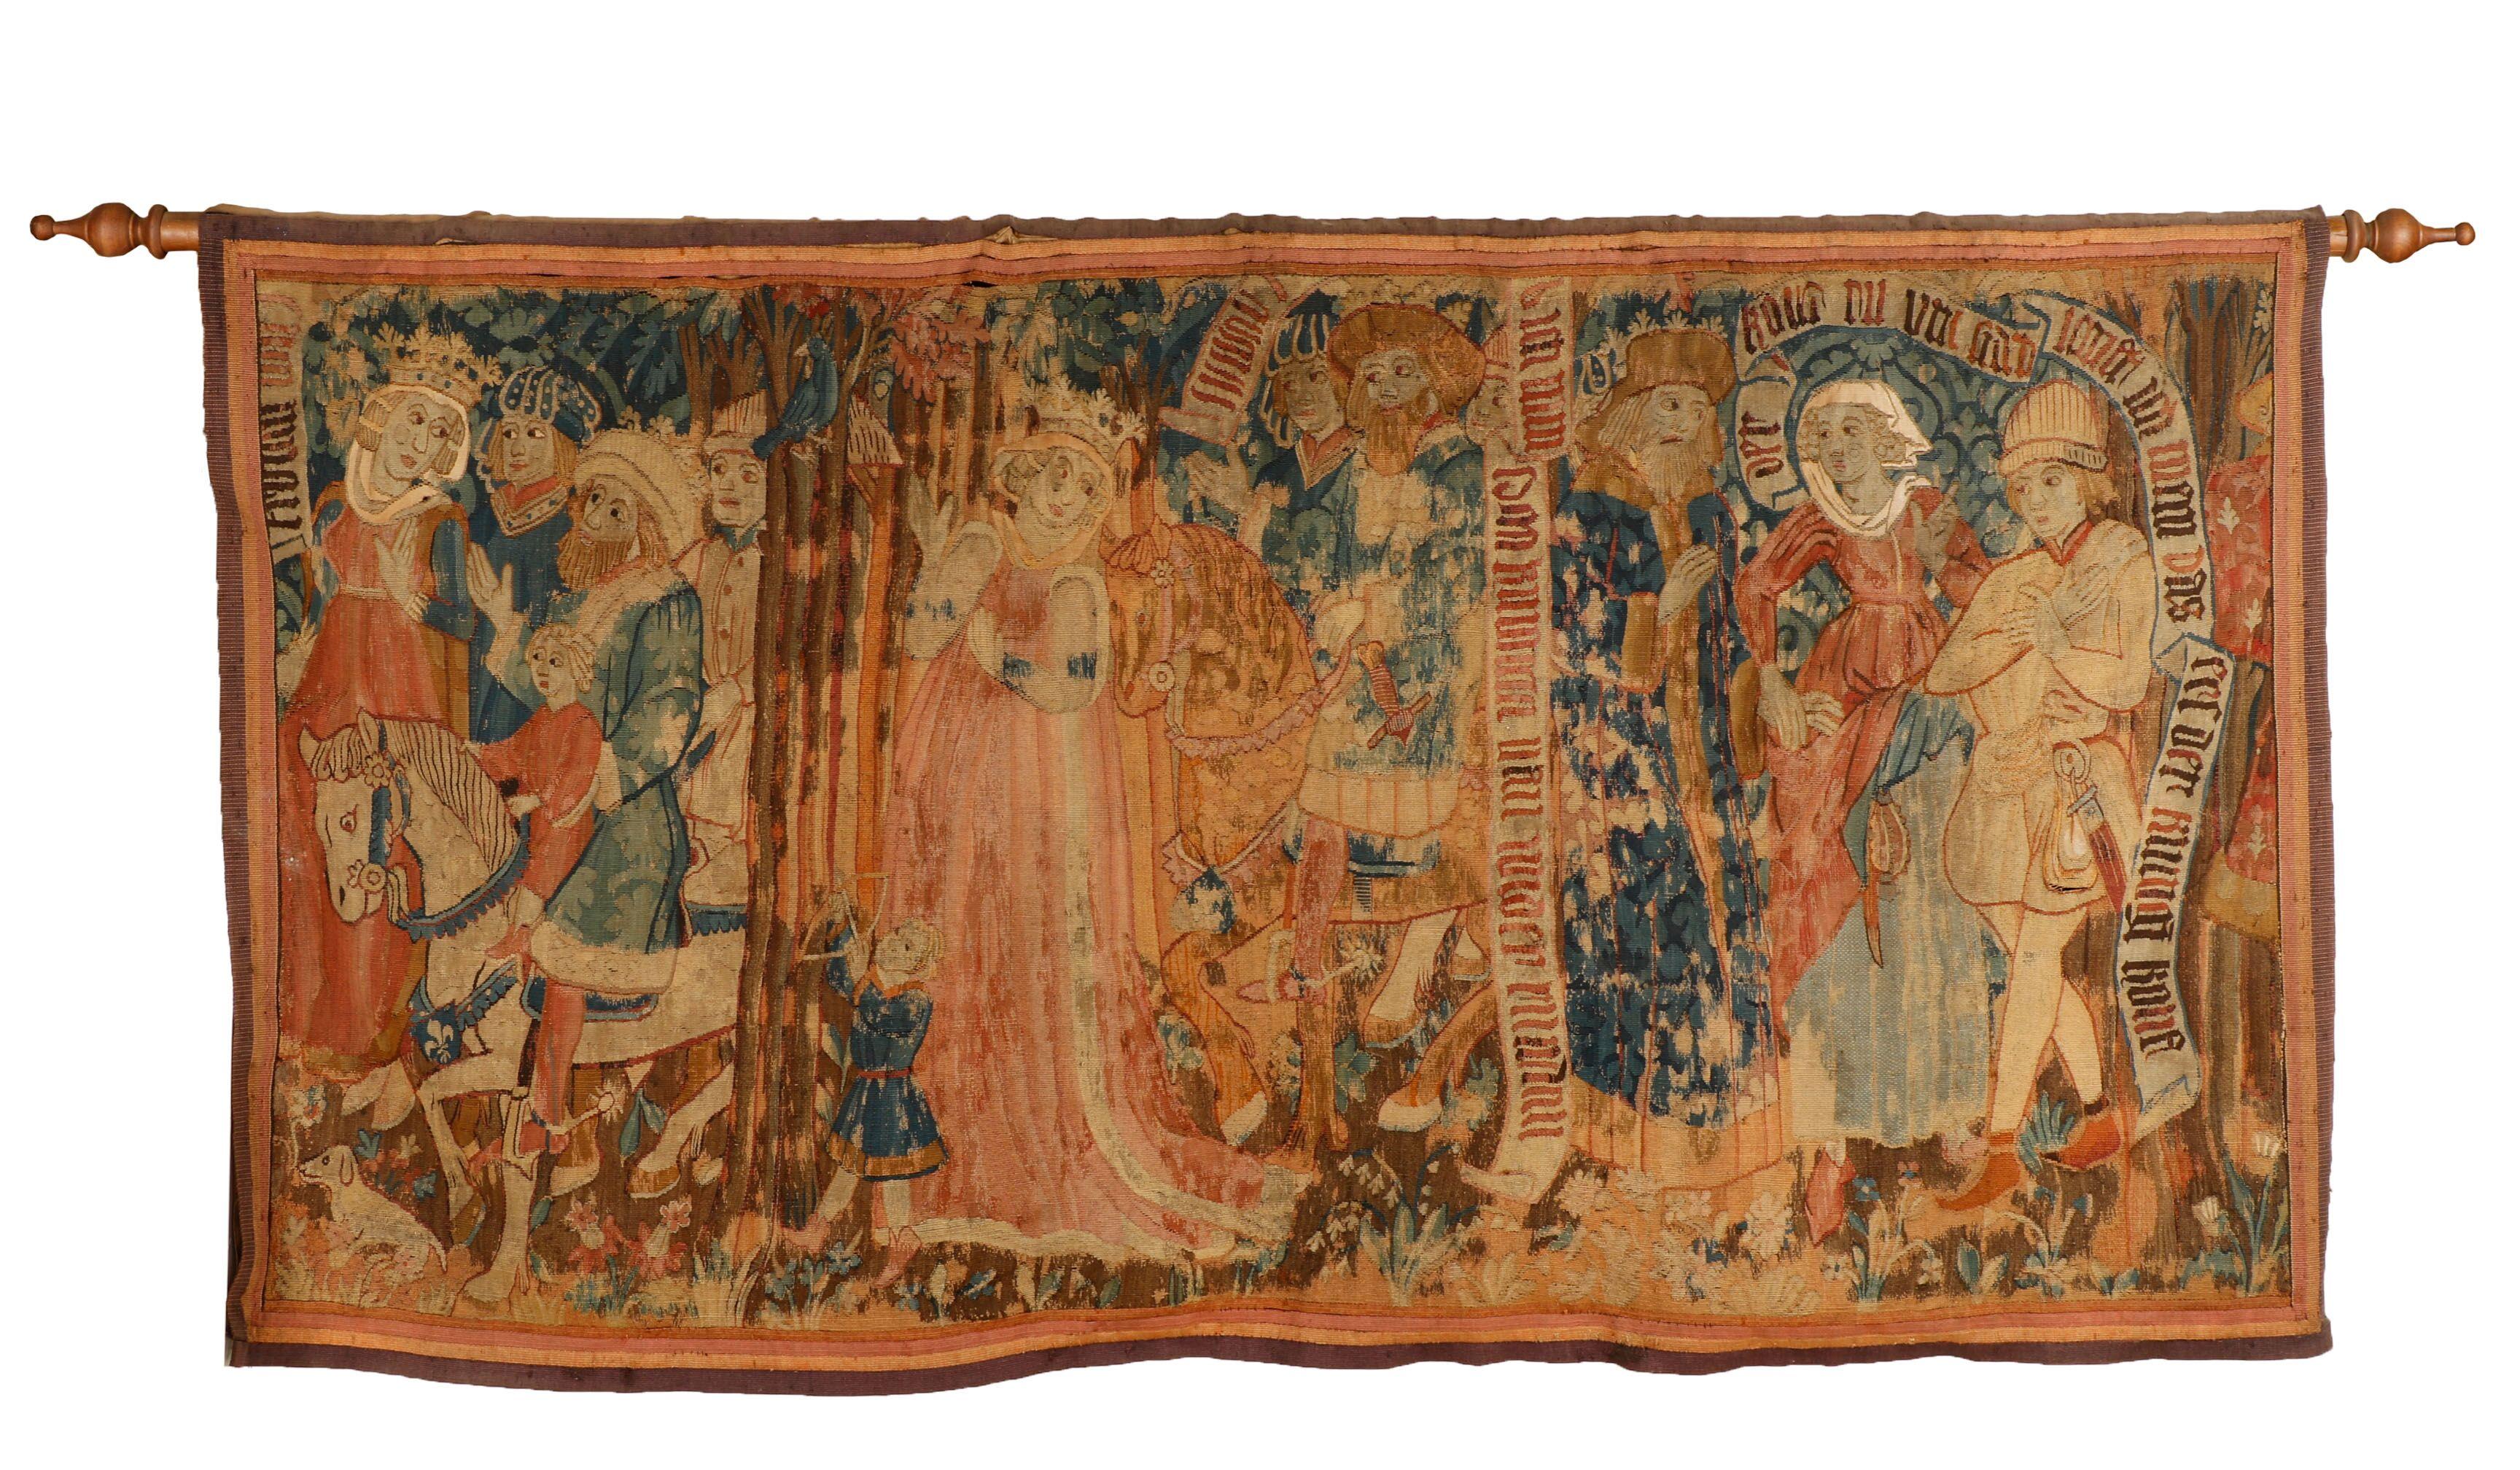 16th century tapestry panel